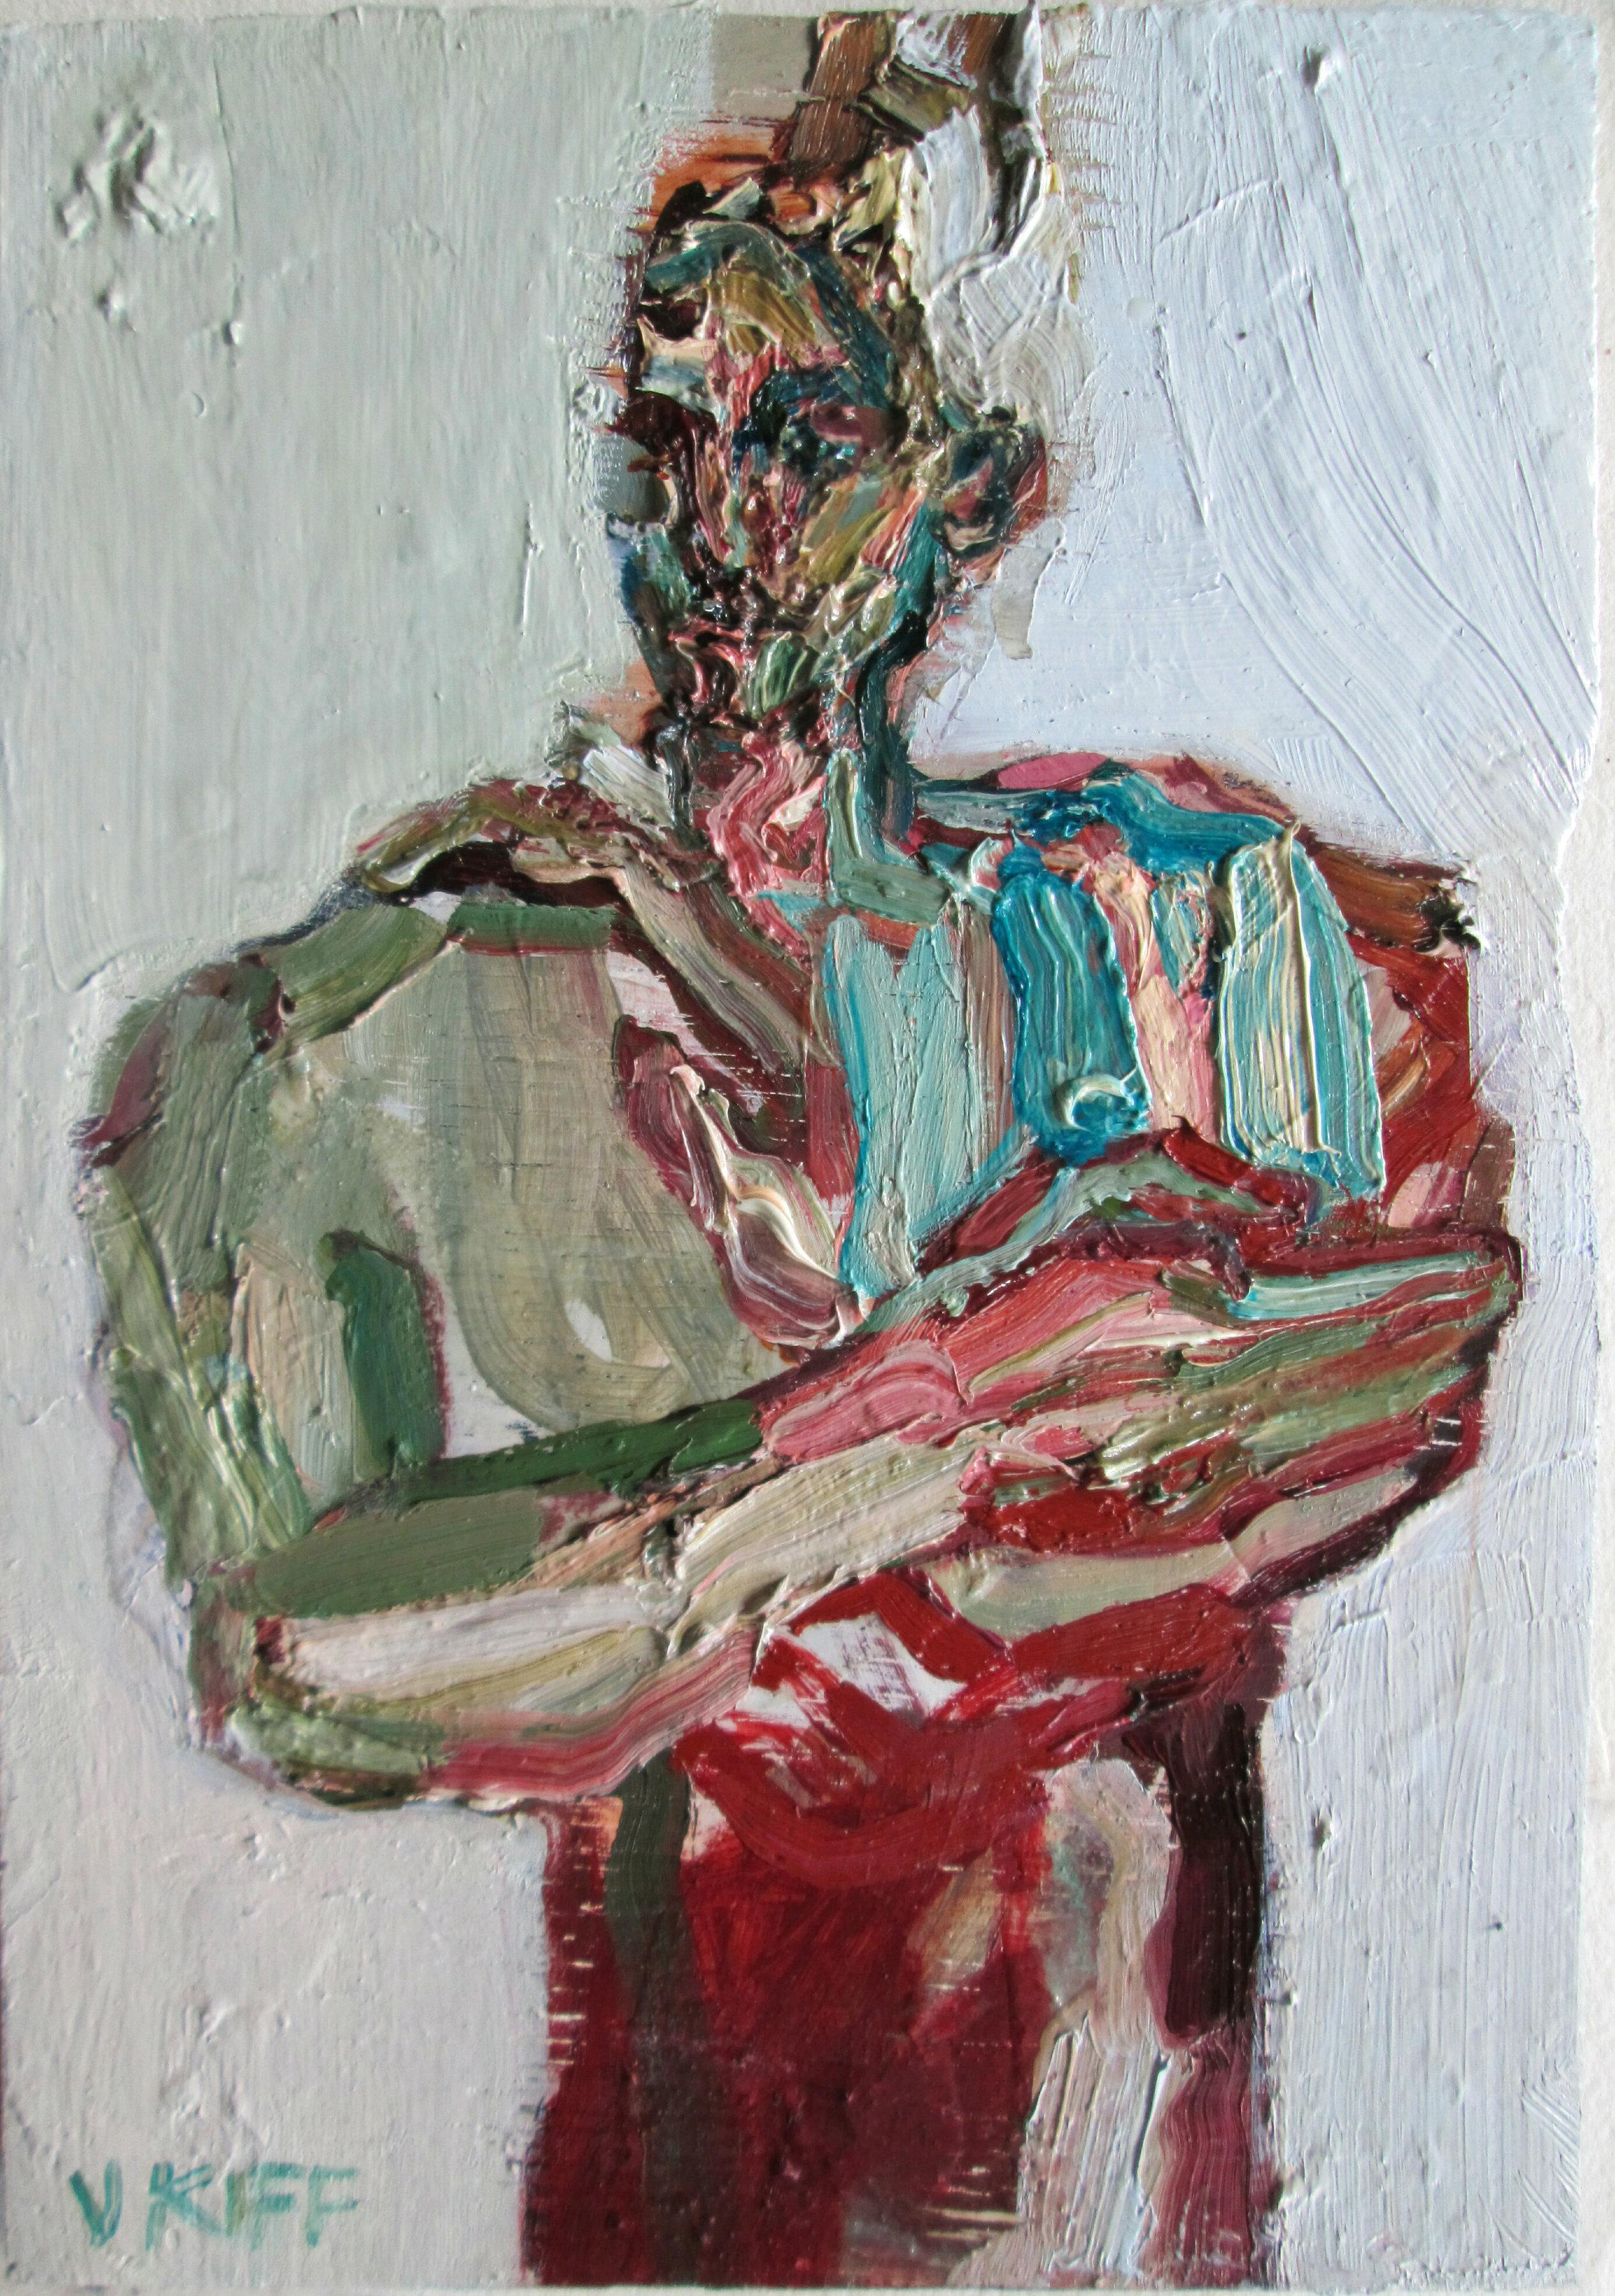 Title: First Lights  Size: 38 x 32 cm  Medium: Oil on wood panel  Price: £700